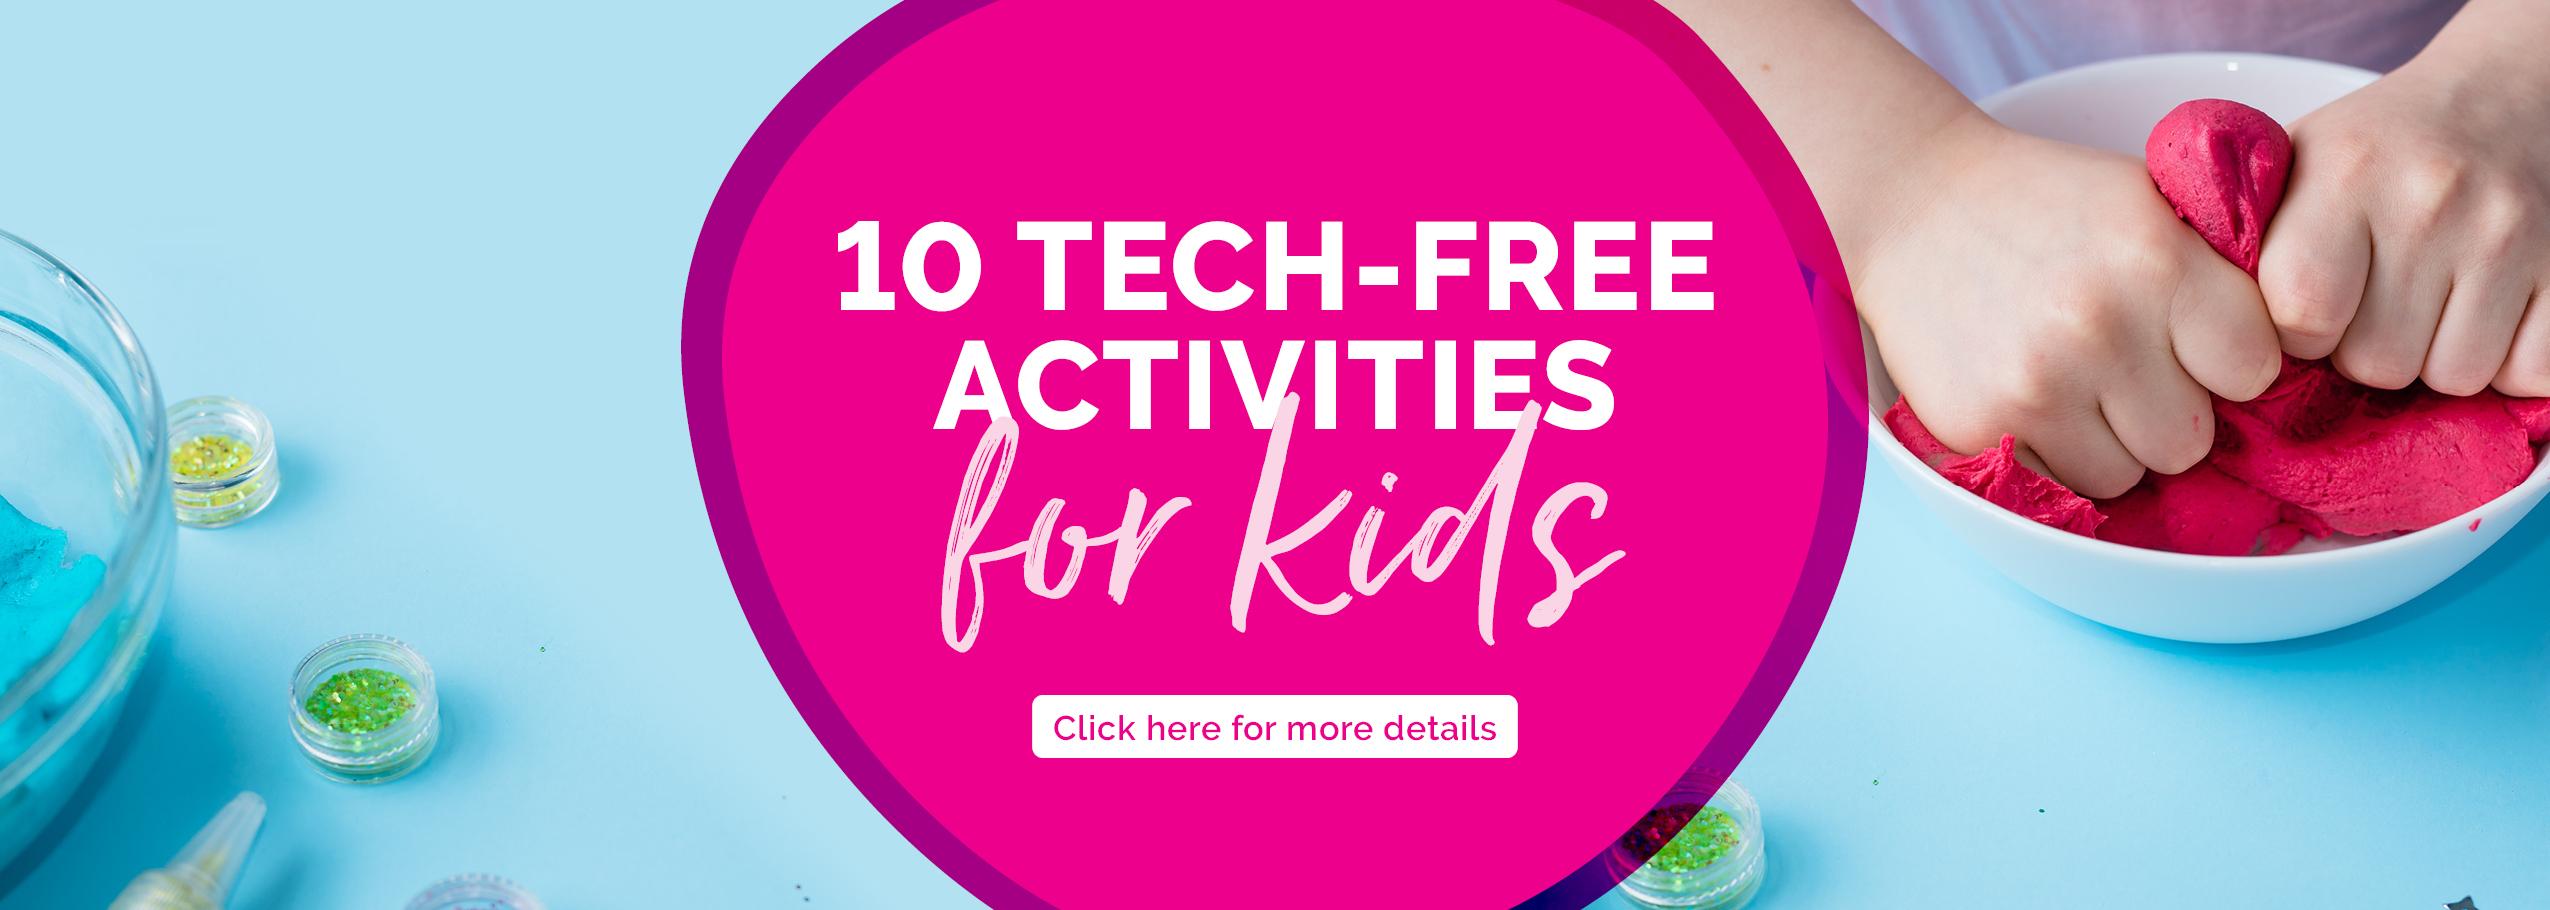 Tech-free-activities-WebBanner-FA2